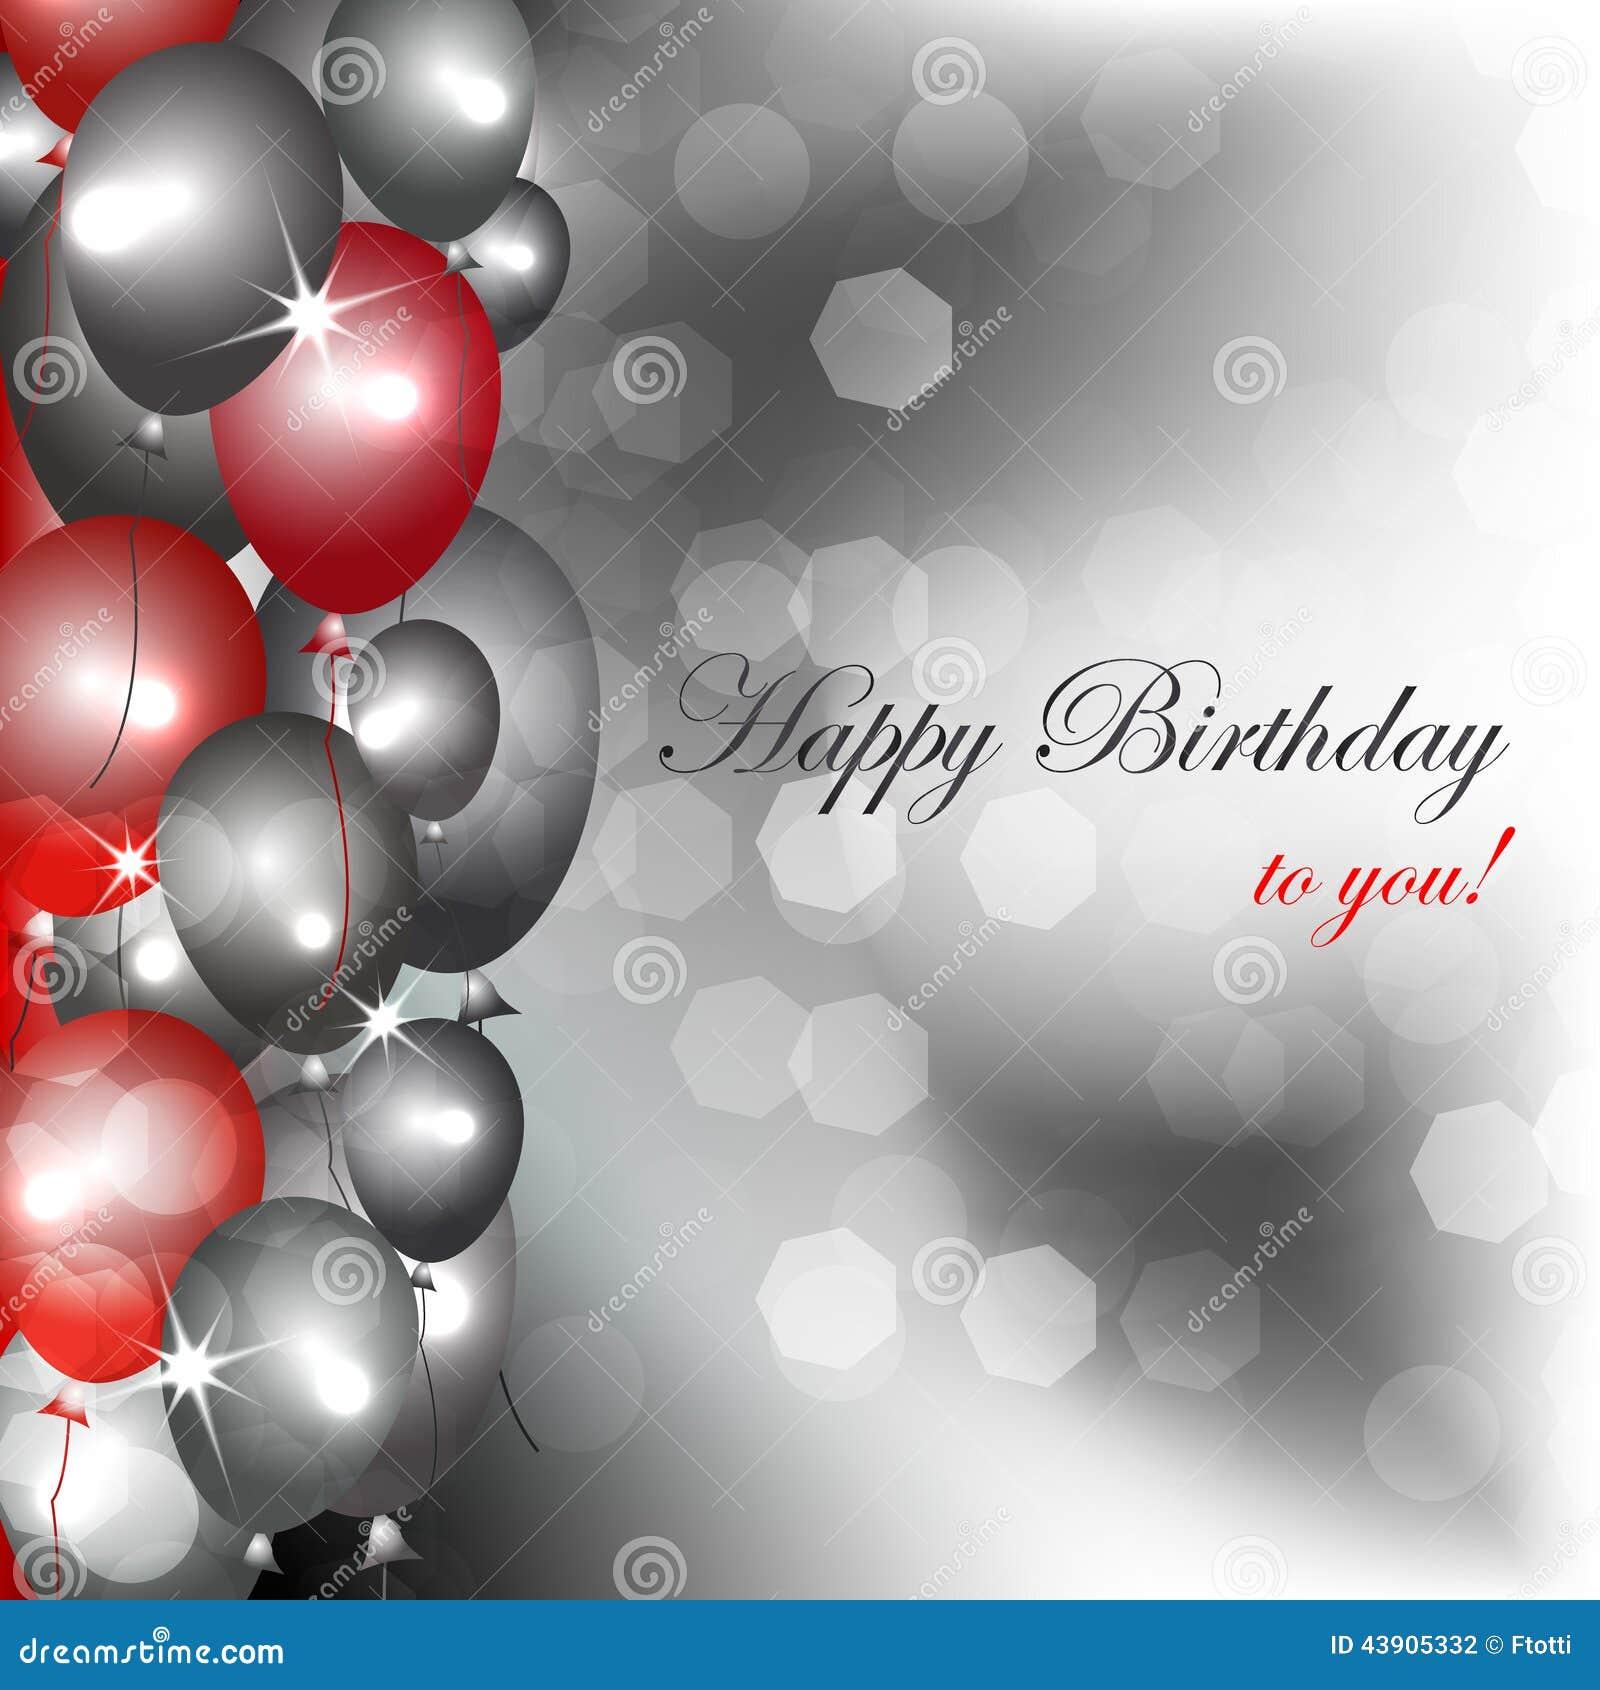 Happy Birthday Star Balloon Cartoon Vector Cartoondealer